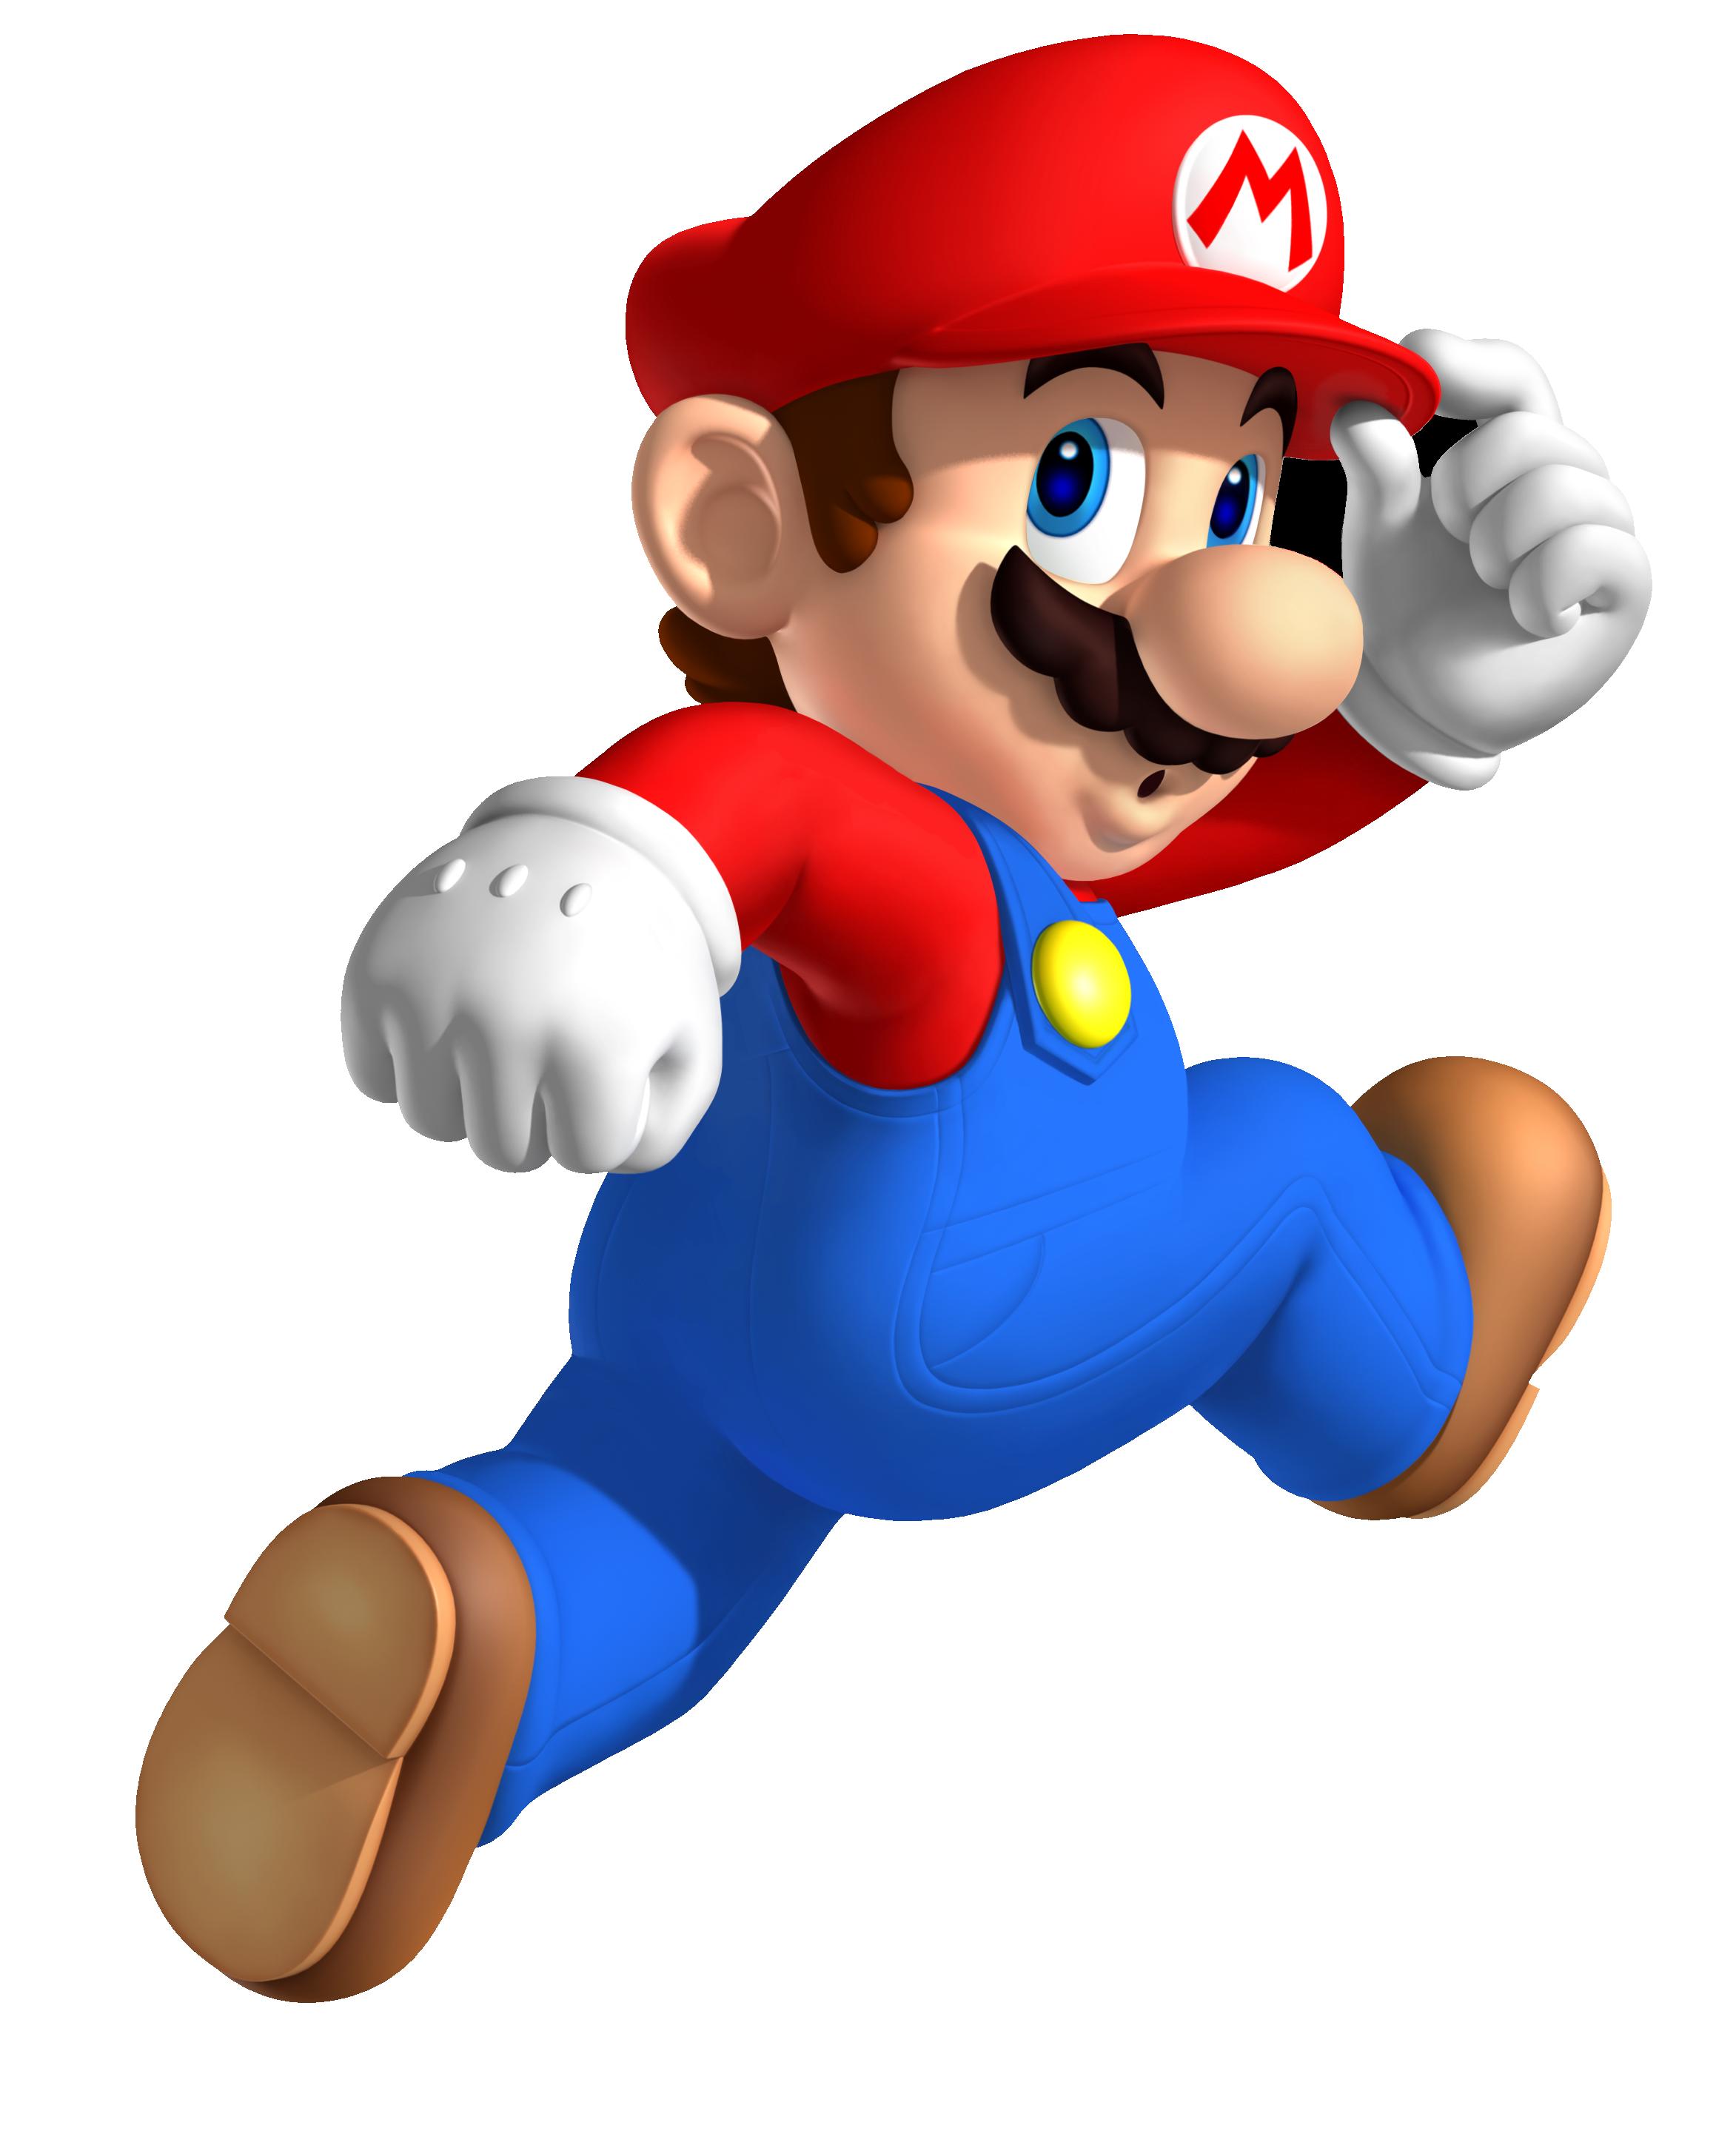 Luxe Dessin à Imprimer De Mario Kart